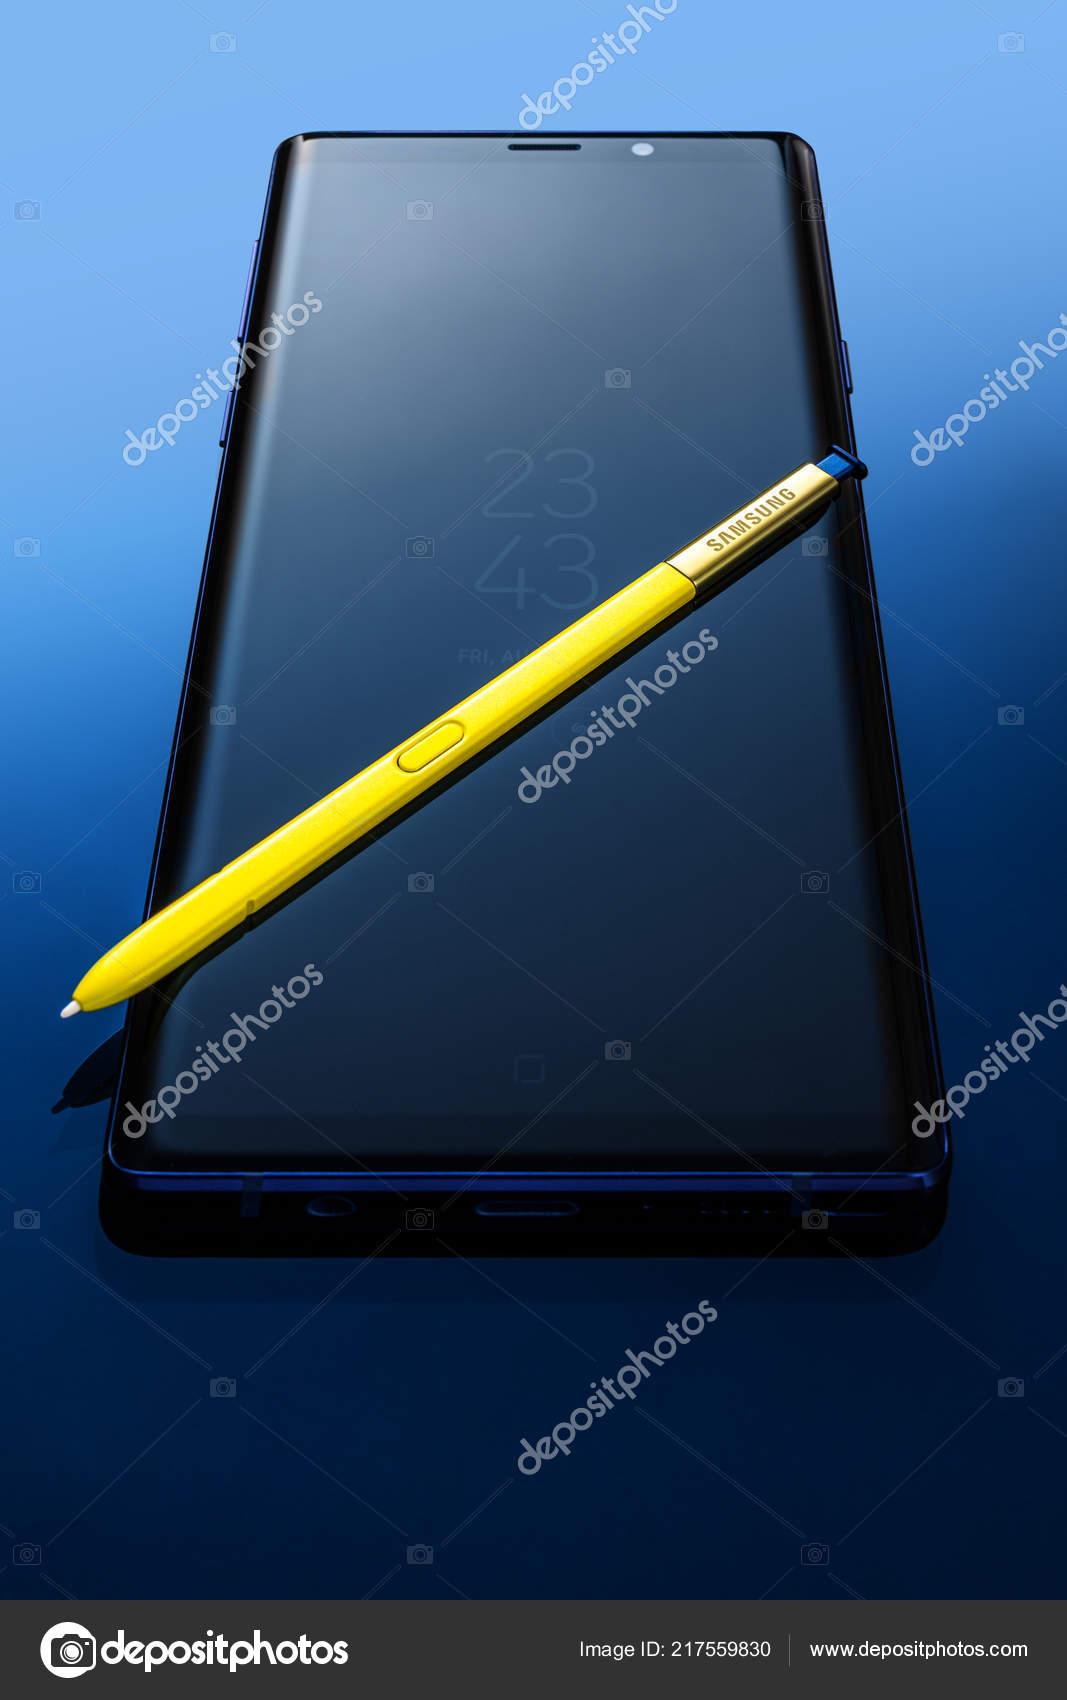 Varna Bulgaria August 2018 Studio Shot Black Samsung Galaxy Note